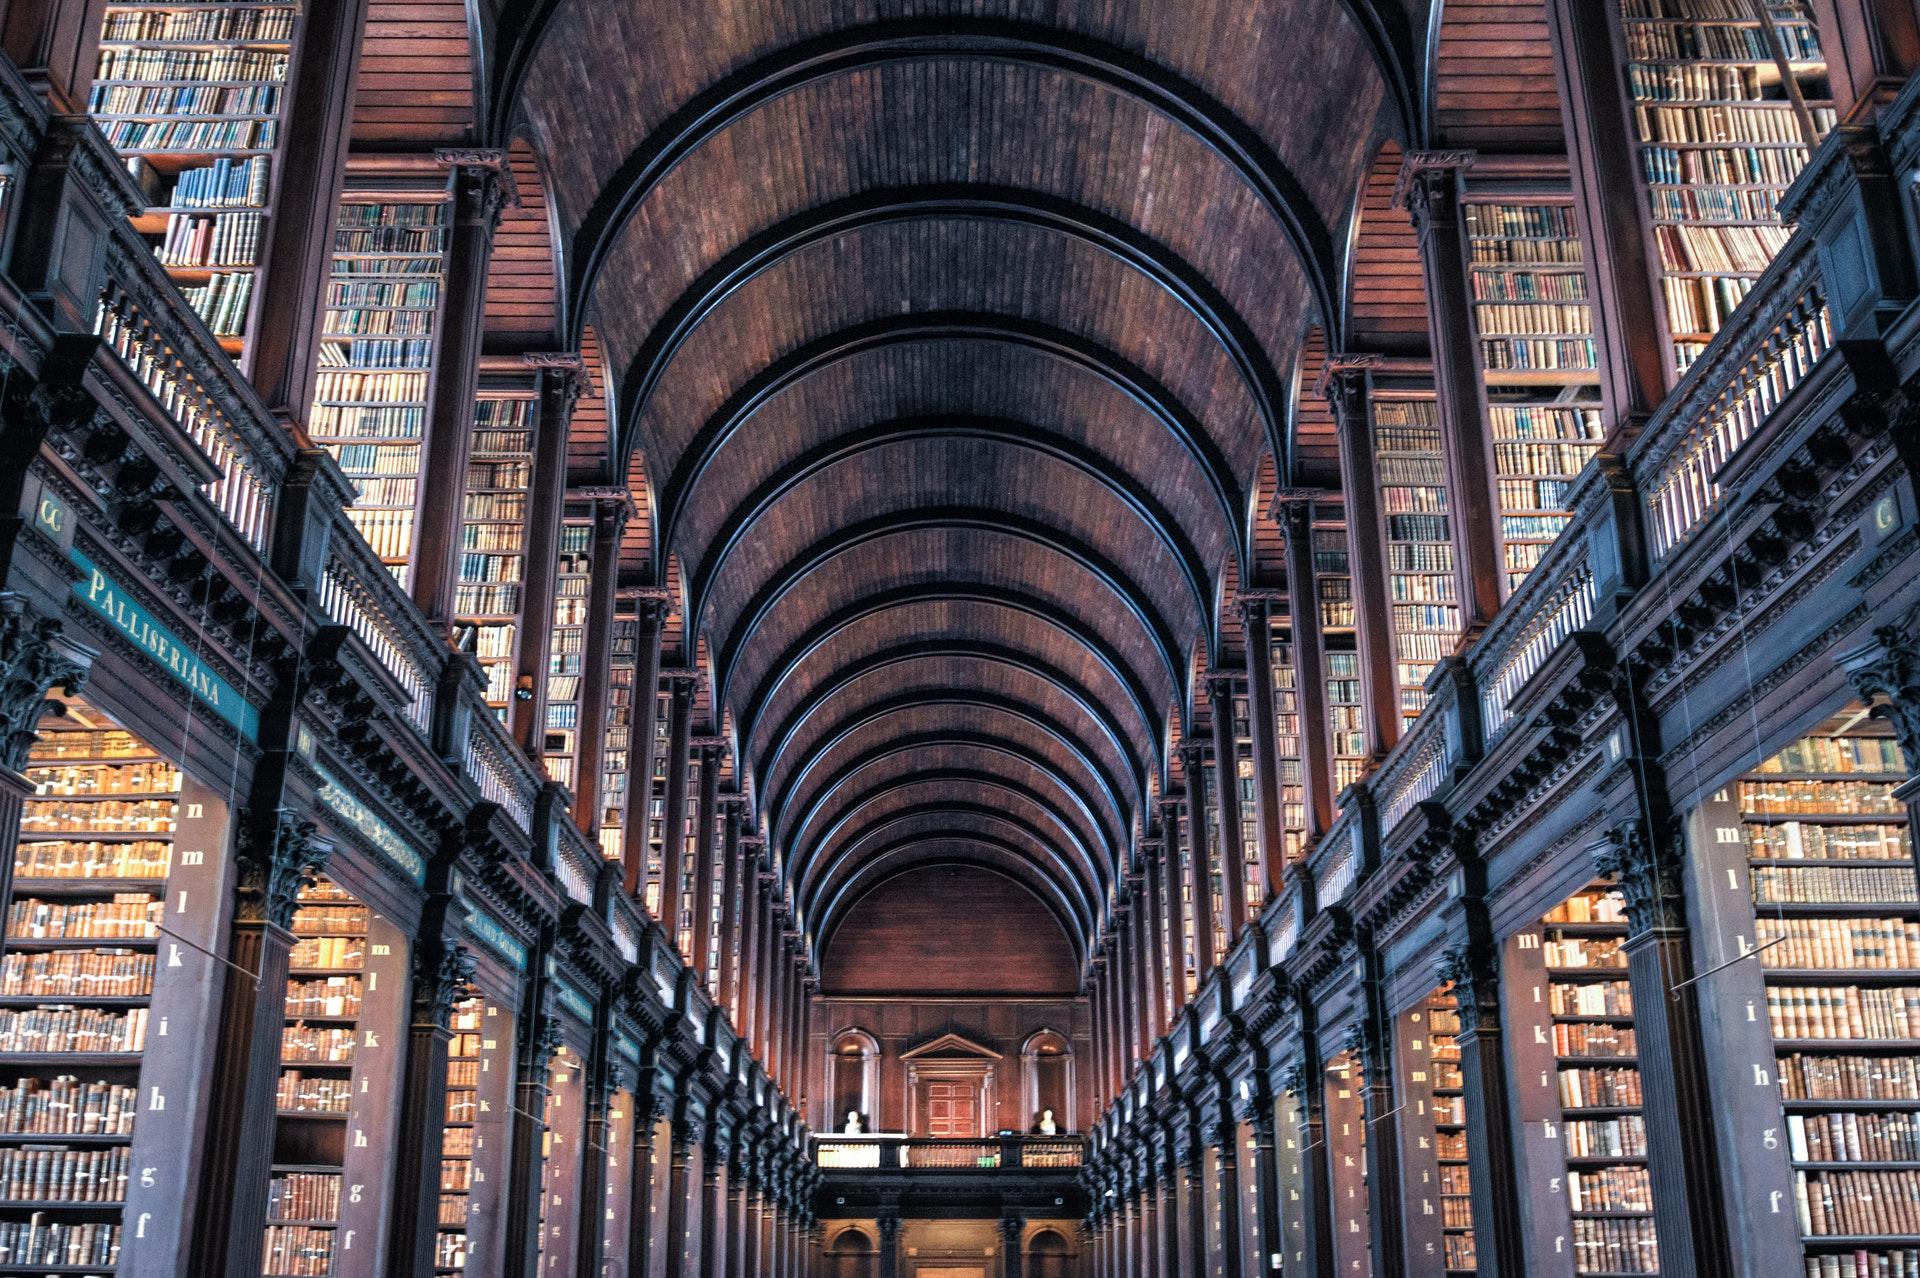 books-shelves-architecture-wood-442420 (1).jpeg